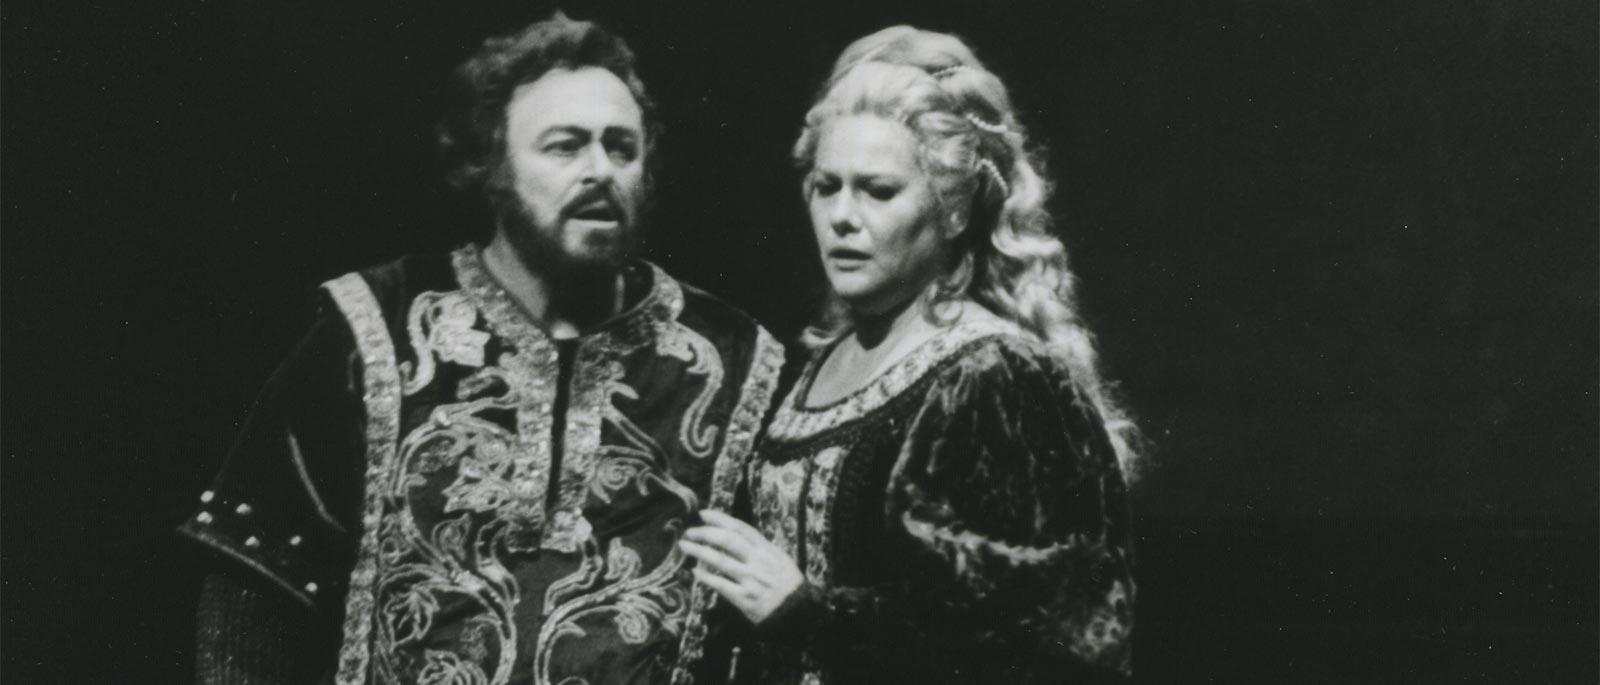 Trovatore Pavarotti, 1600x685.jpg